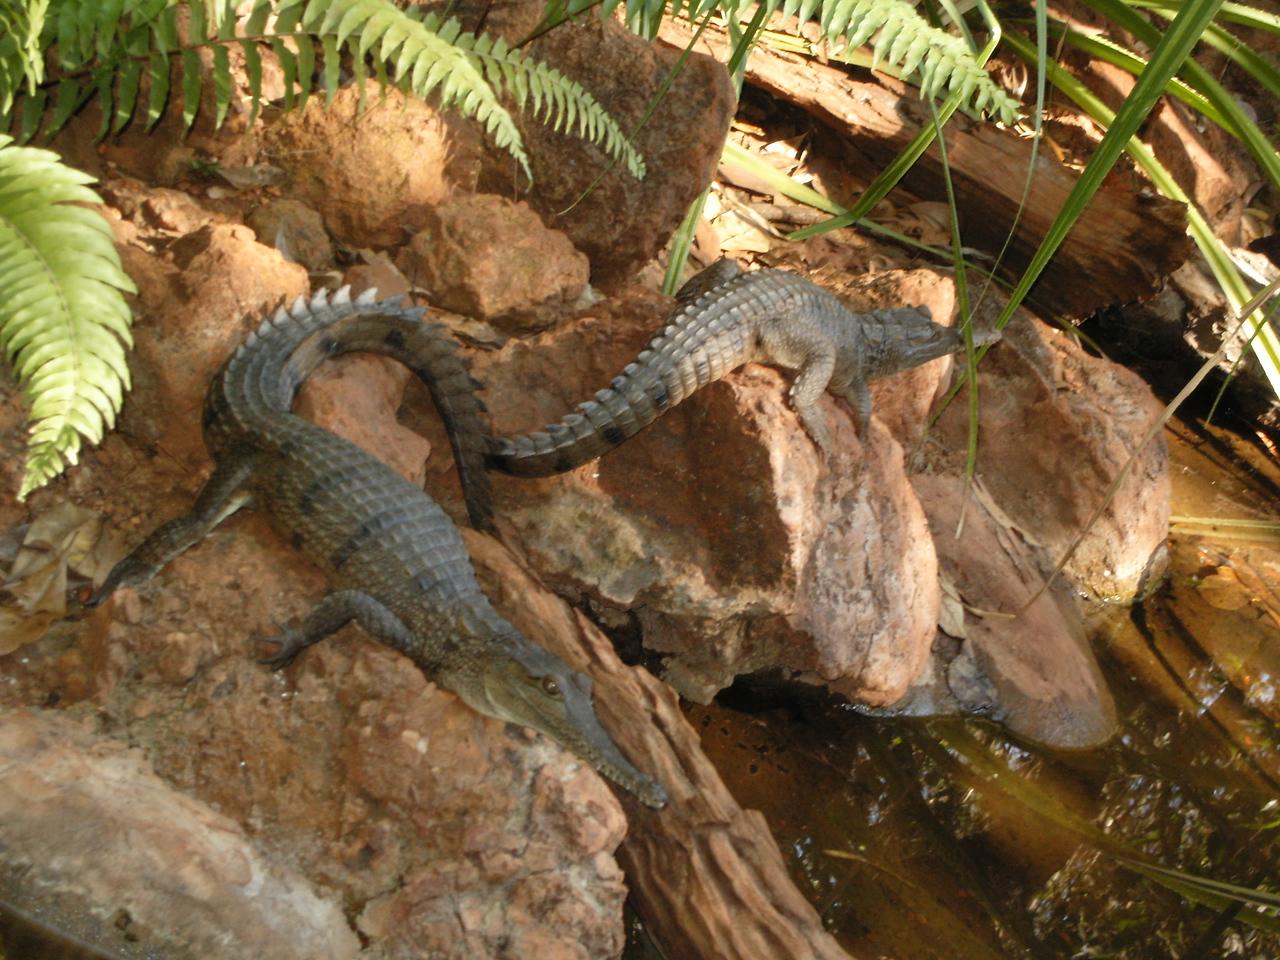 Freshwater alligators at Territory Wildlife Park.